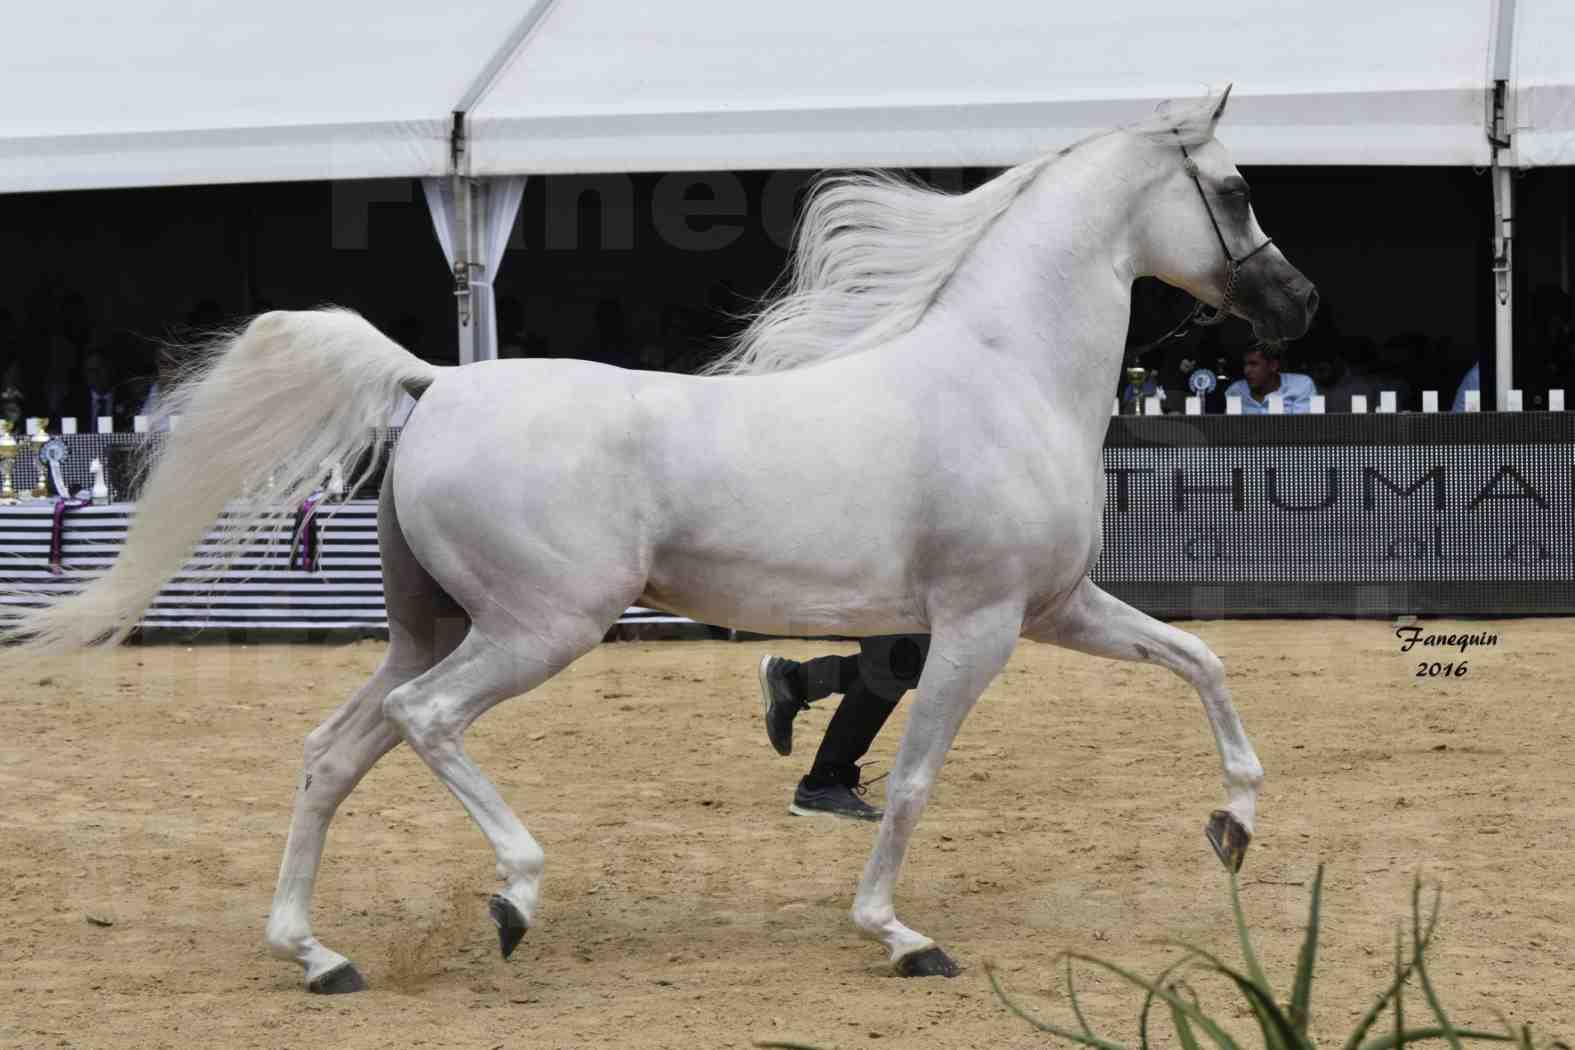 Show International de chevaux ARABES de MENTON 2016 - AJA ANGELO - 26